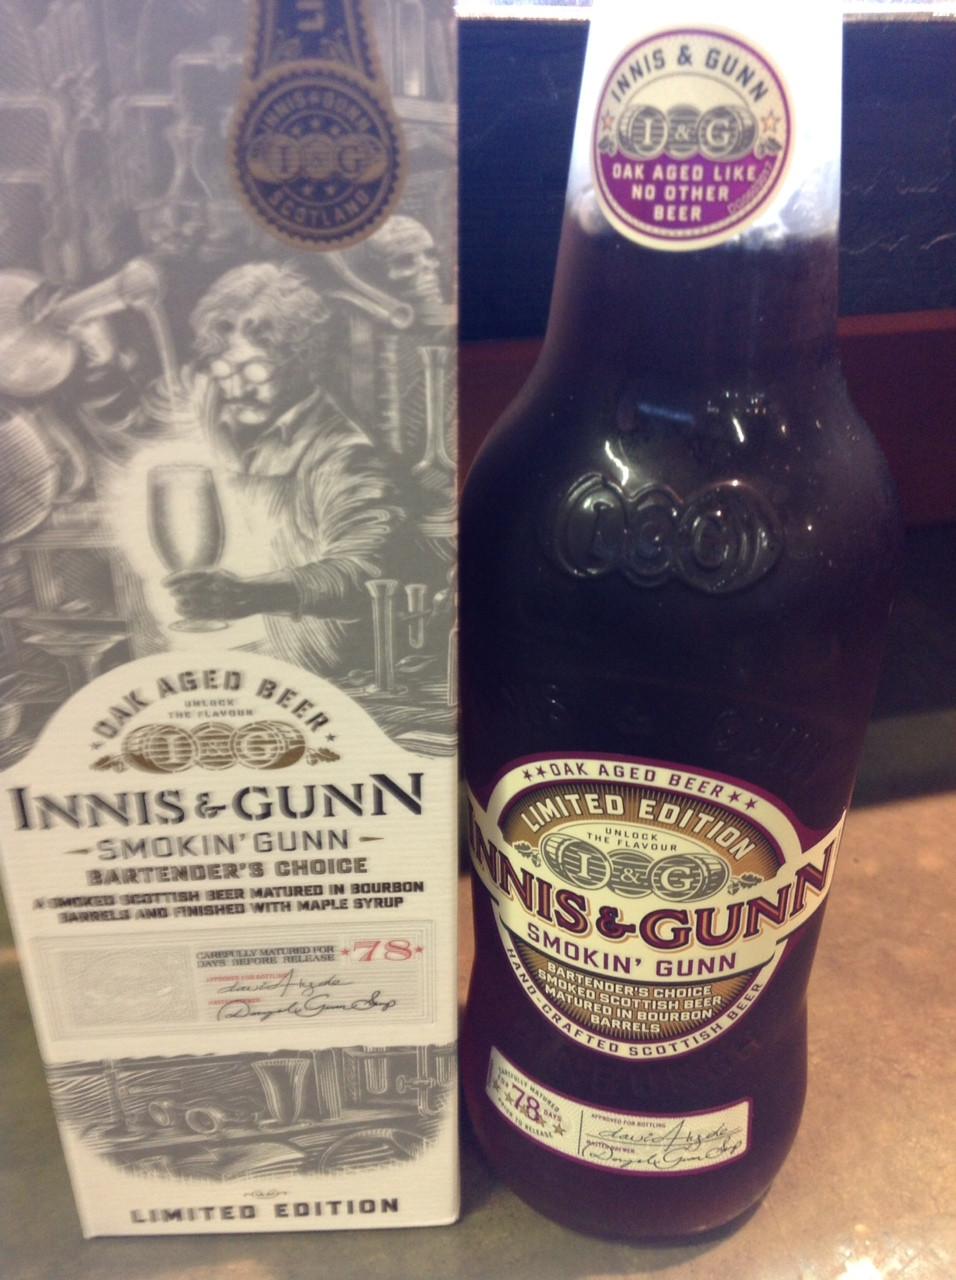 Innis & Gunn Smoking Gun.JPG